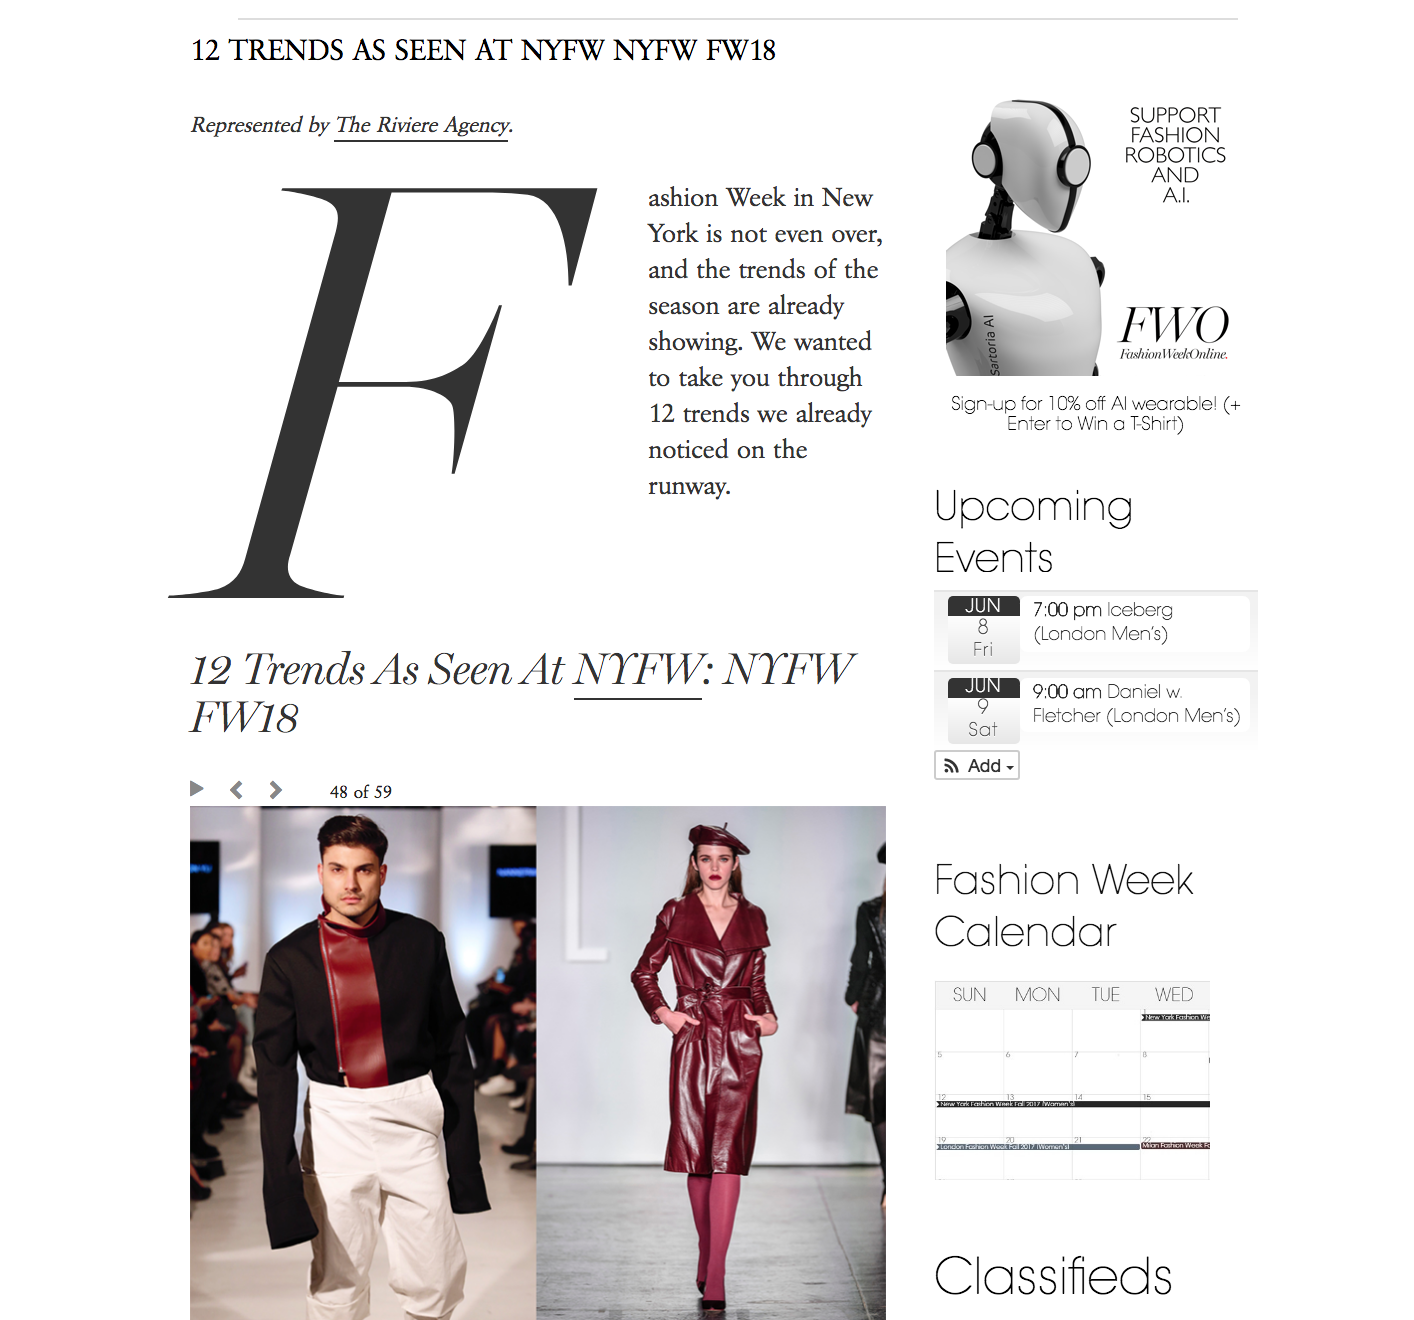 fashion week online - http://fashionweekonline.com/12-trends-seen-nyfw-fall-2018-new-york-fashion-week